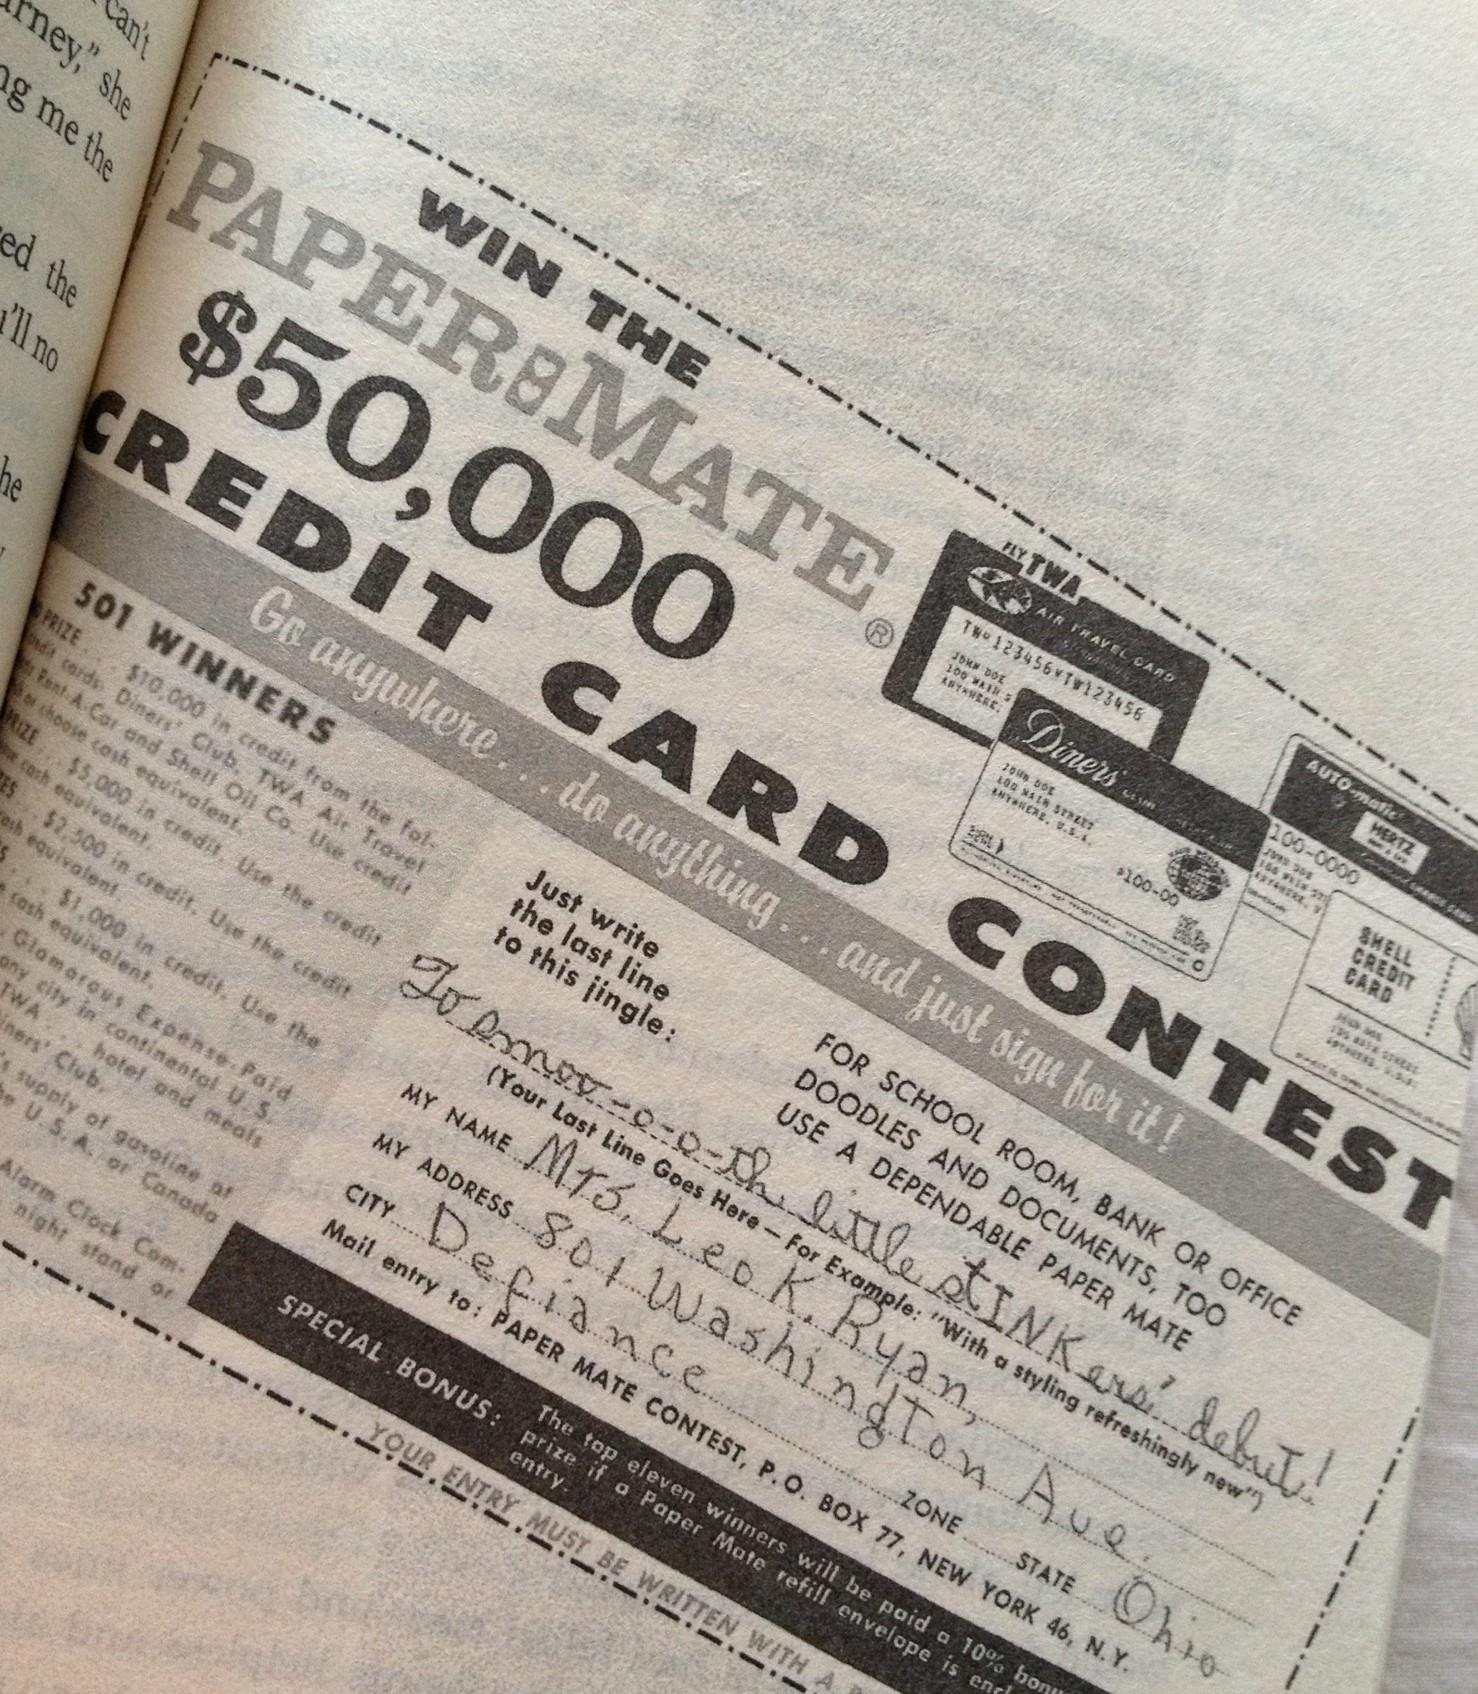 Paper-Mate-advertising-contest-book-excerpt